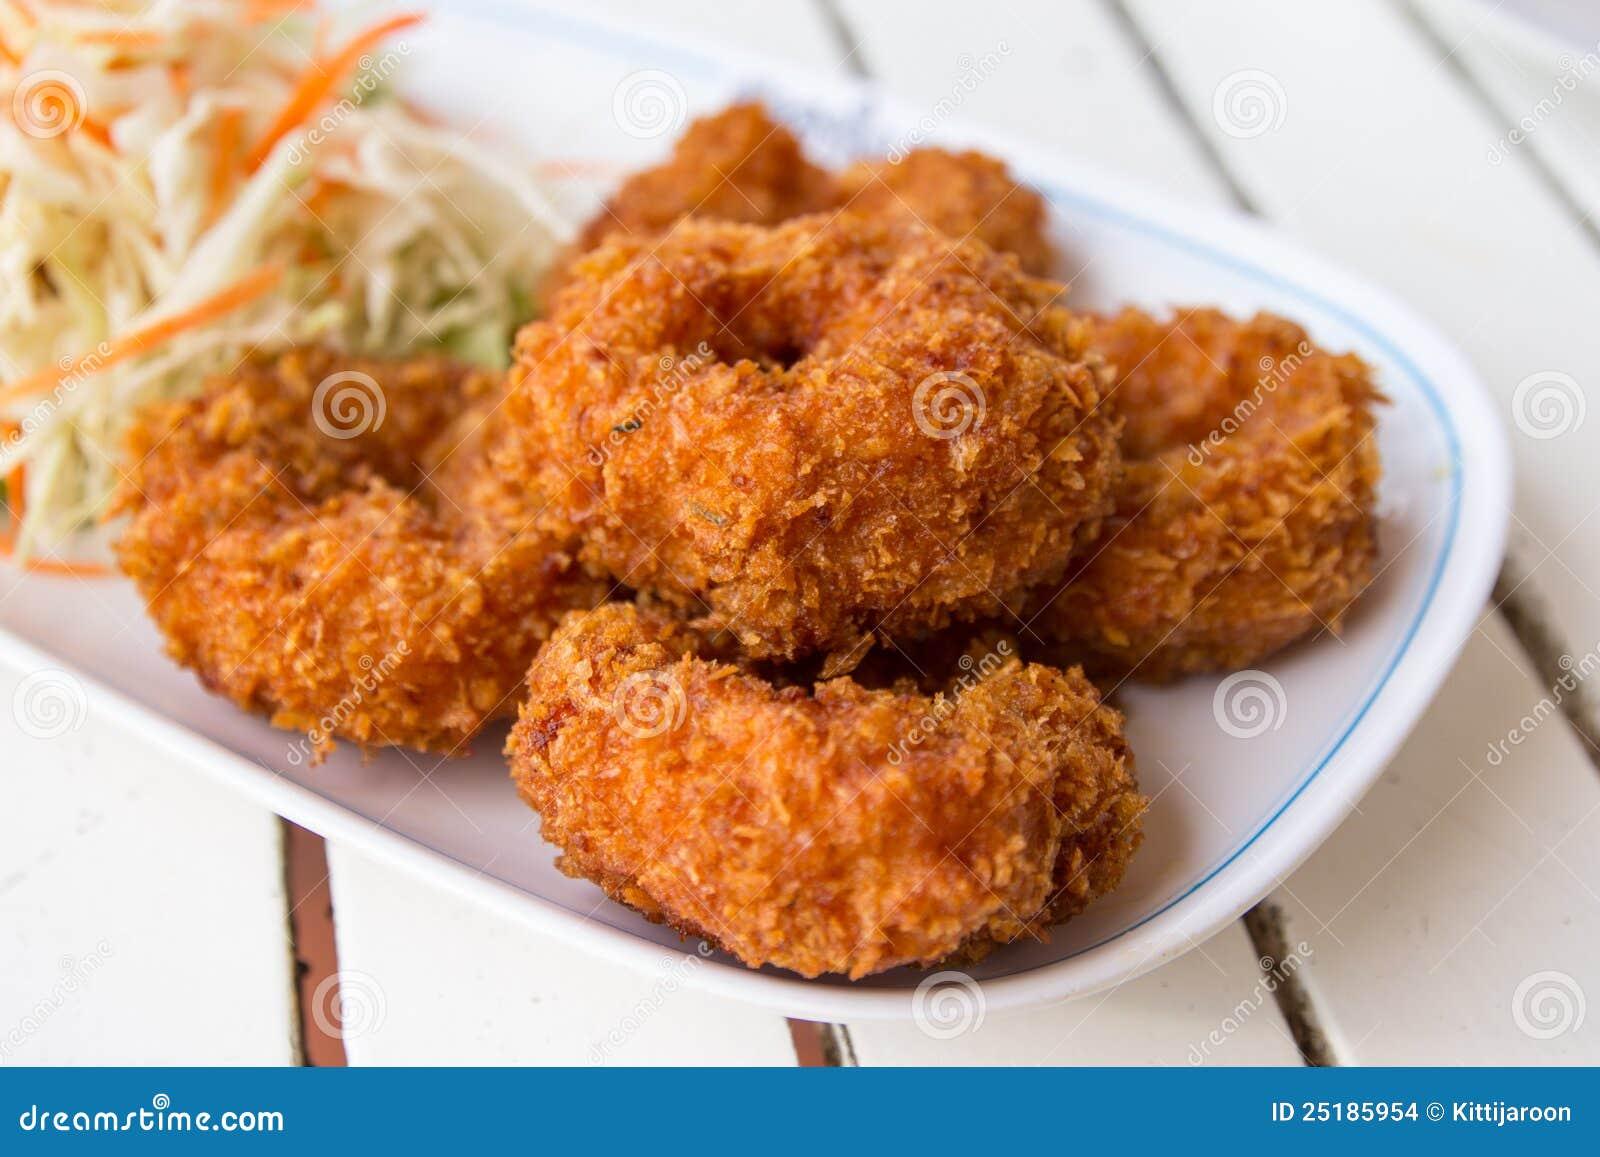 Deep Fried Shrimp Cakes Stock Images - Image: 25185954